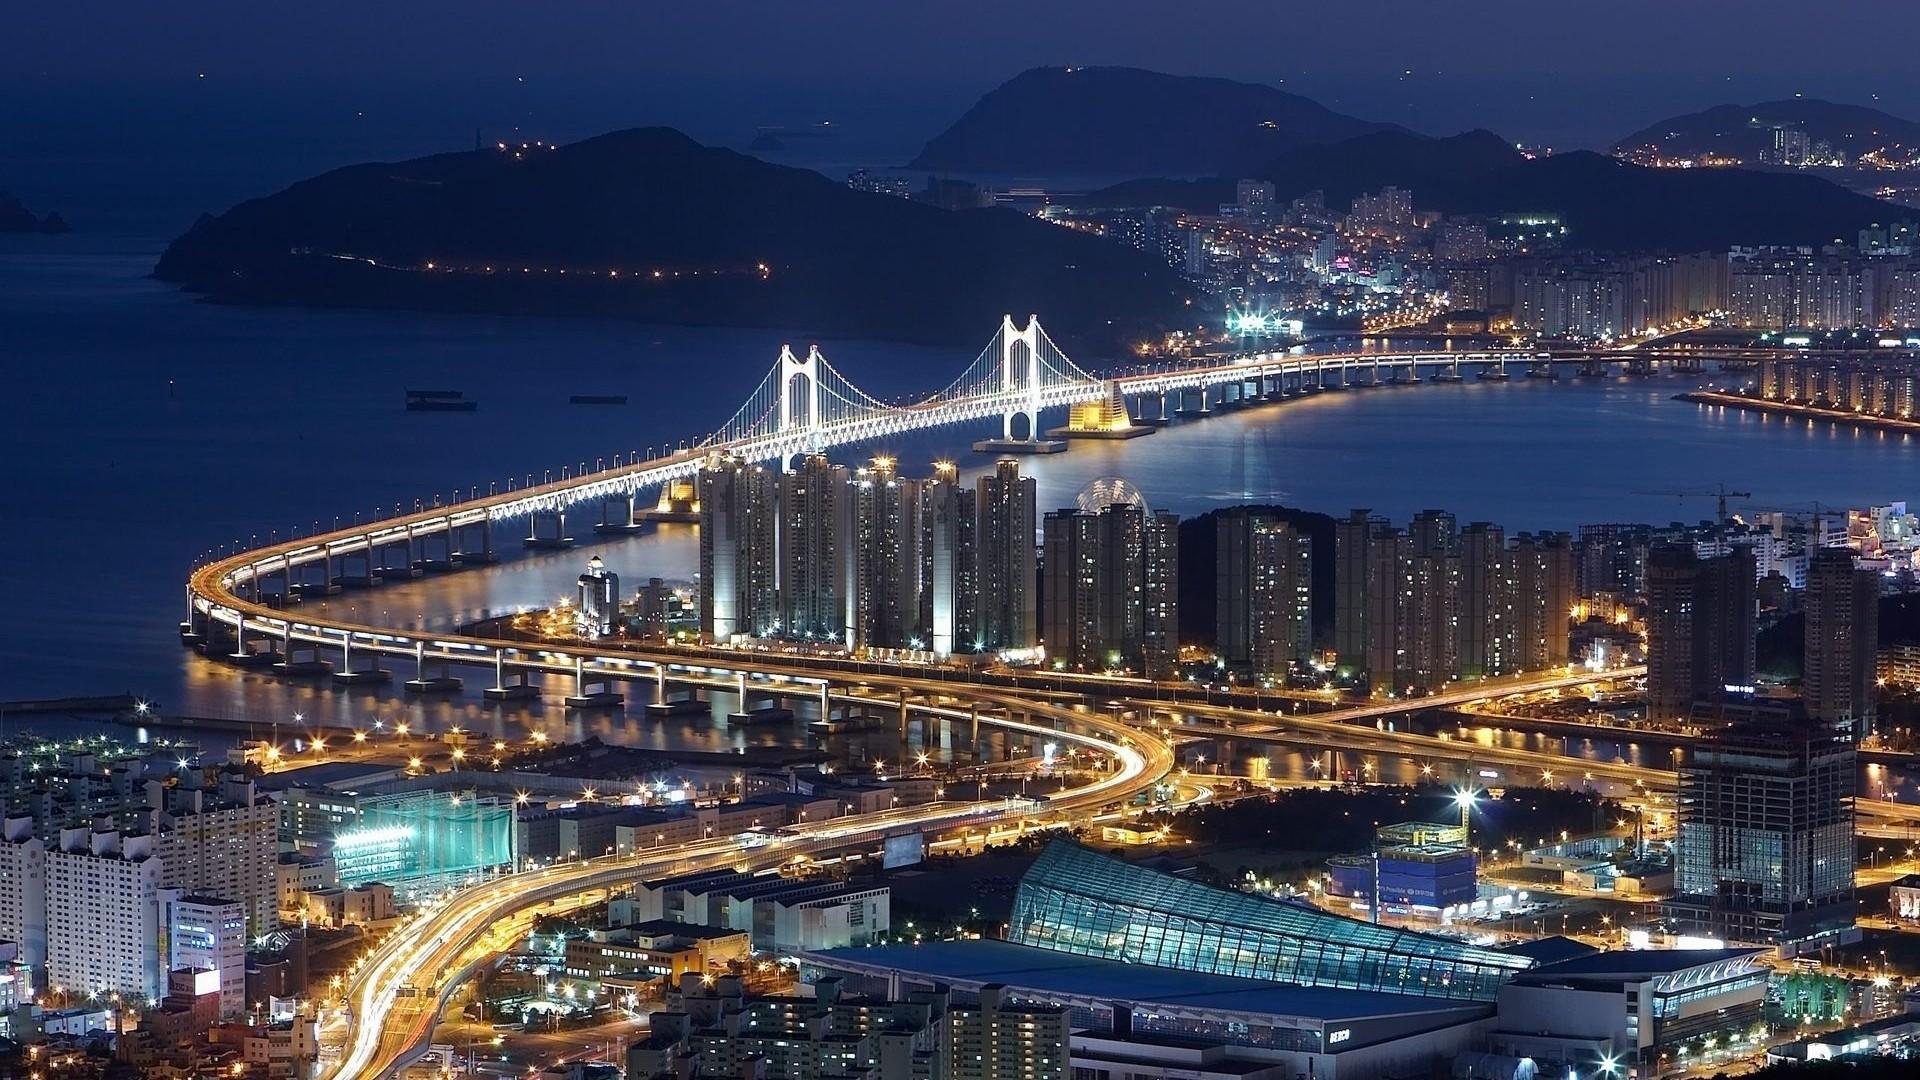 Seoul Wallpaper Image